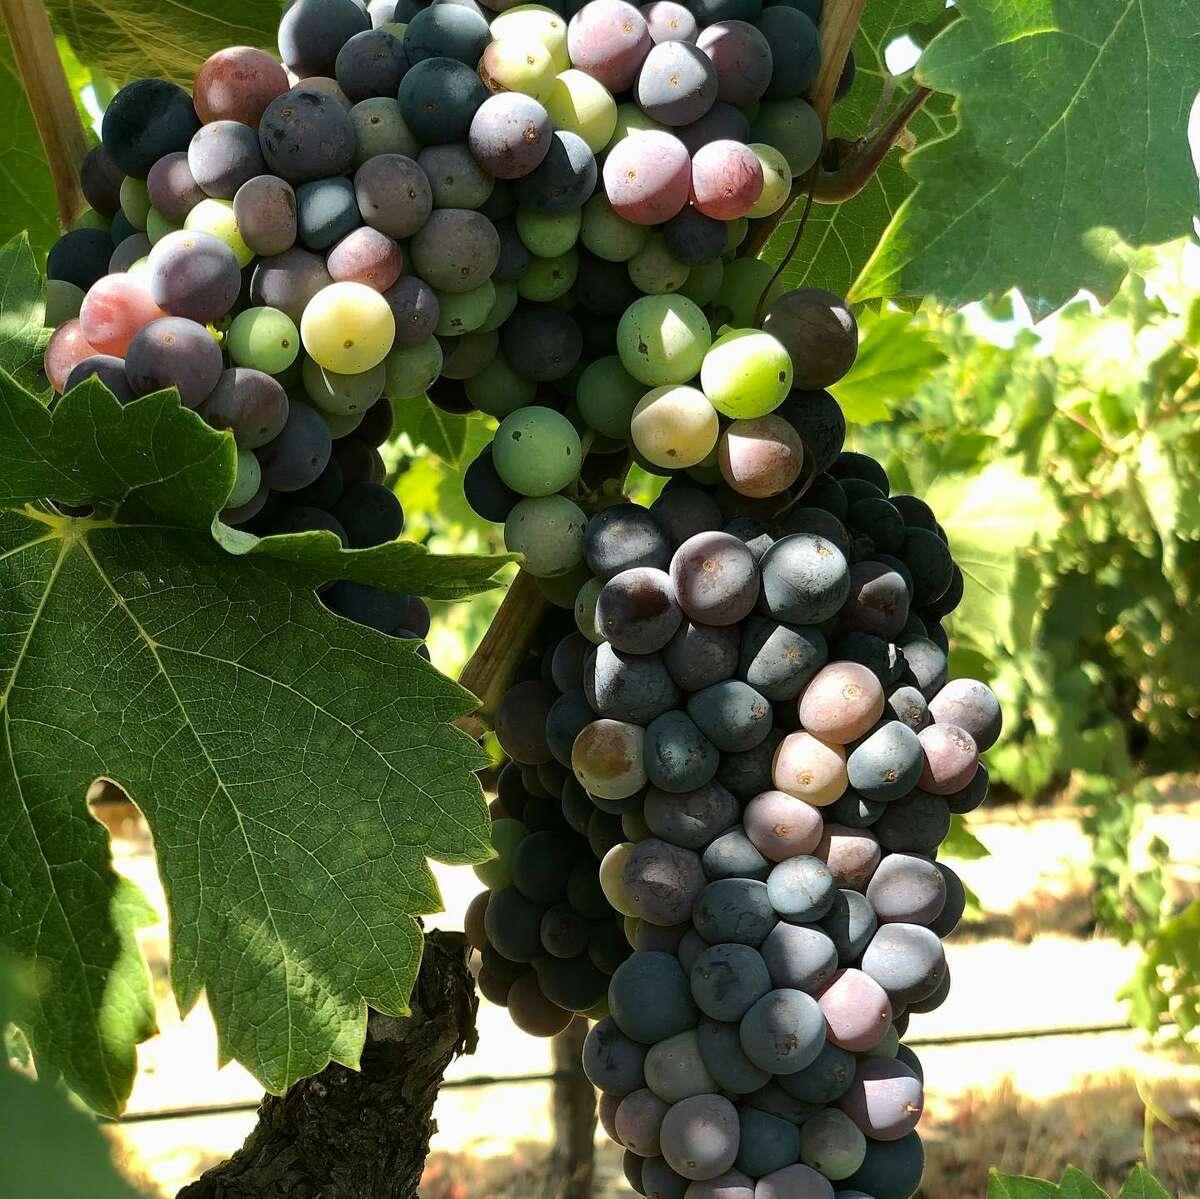 Berghold Vineyards offers popular signatures like Viognier, Zinfandel and Ruby Port.